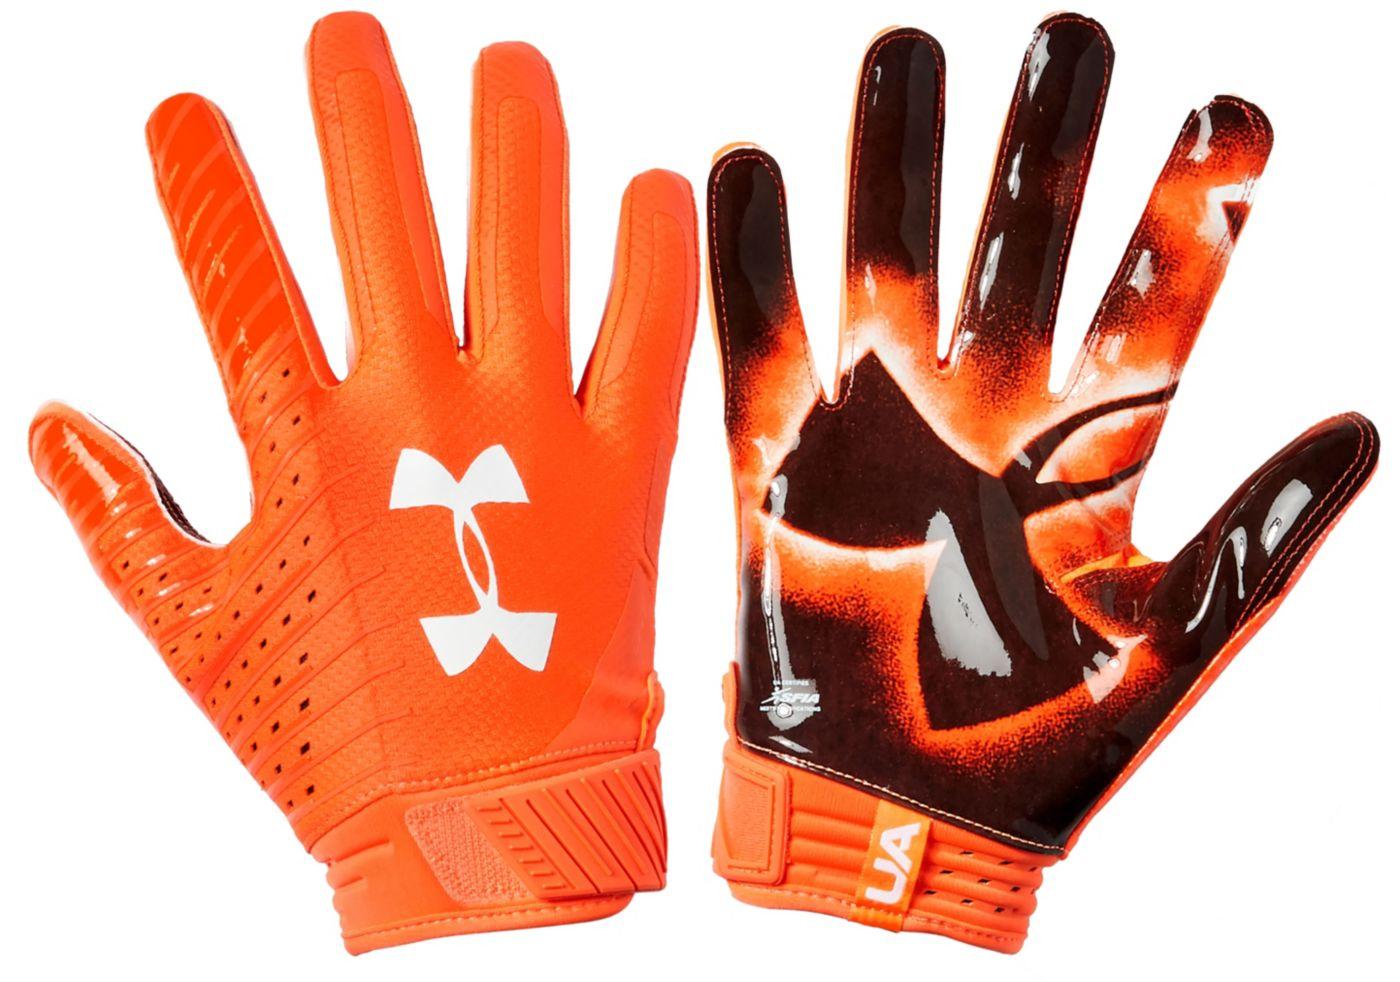 Under Armour Spotlight LE NFL Receiver Gloves